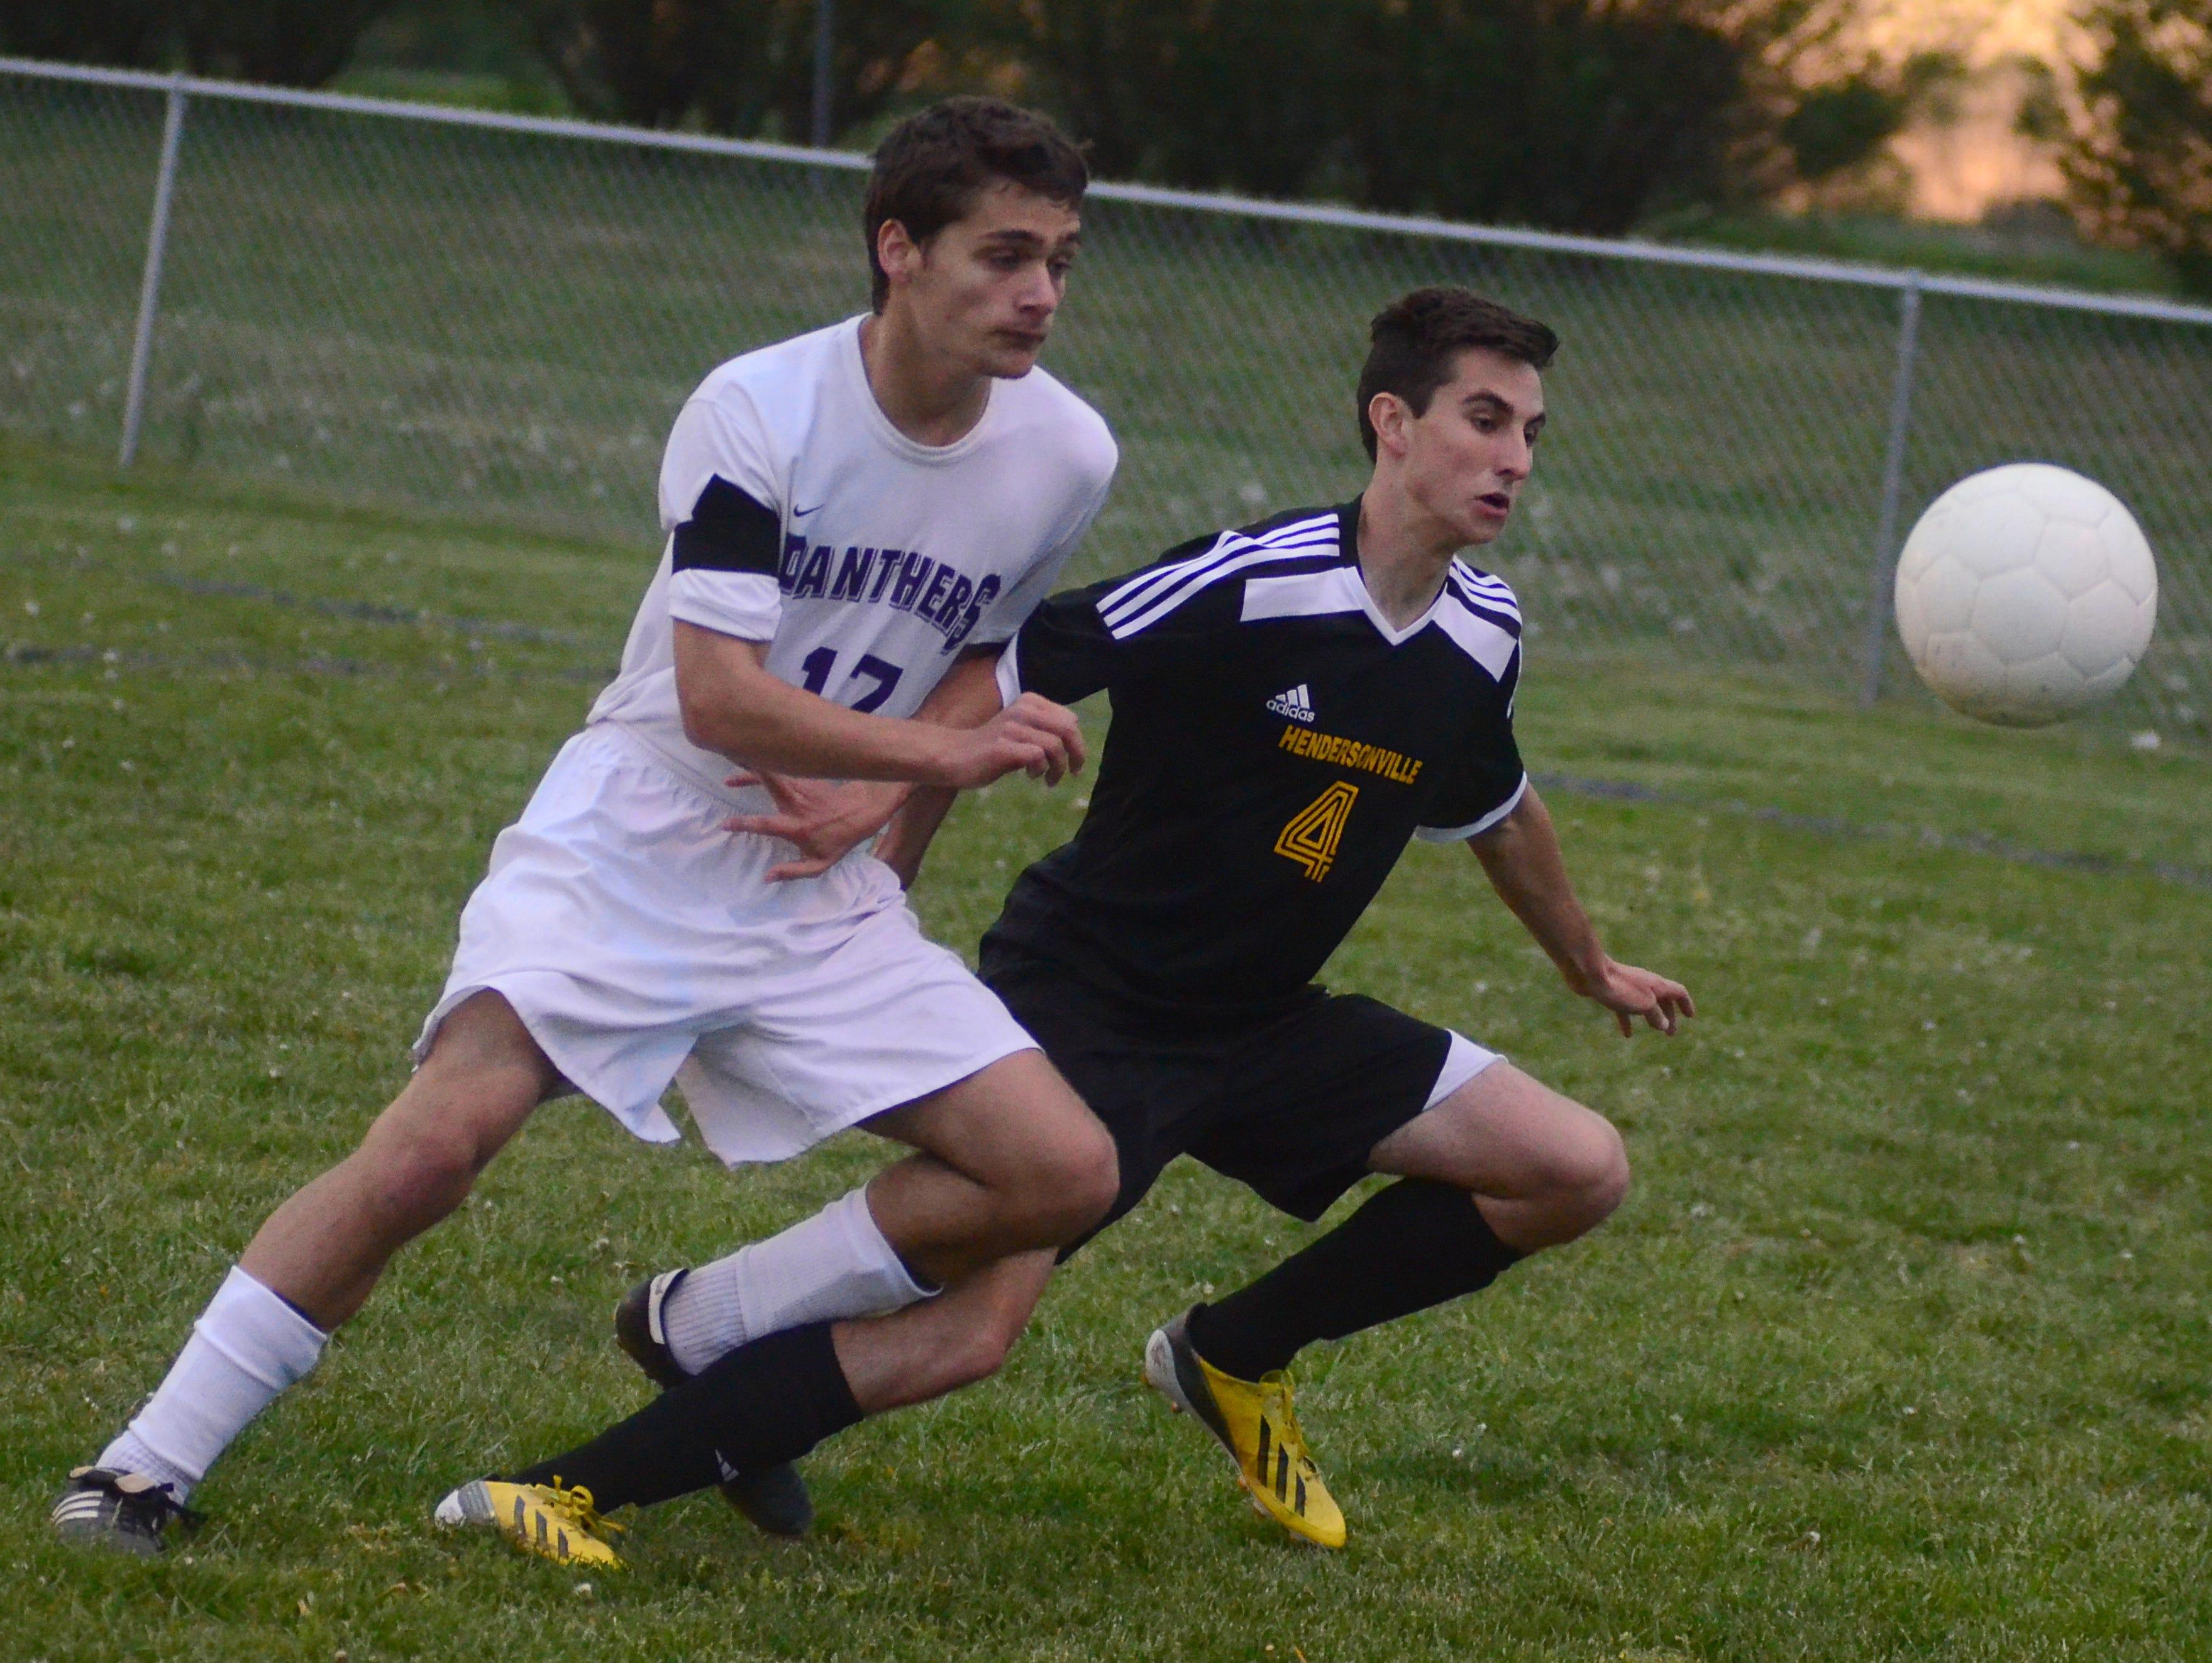 Portland High sophomore Evan Decker (17) battles Hendersonville senior Ethan Salley for possession during first-half action.